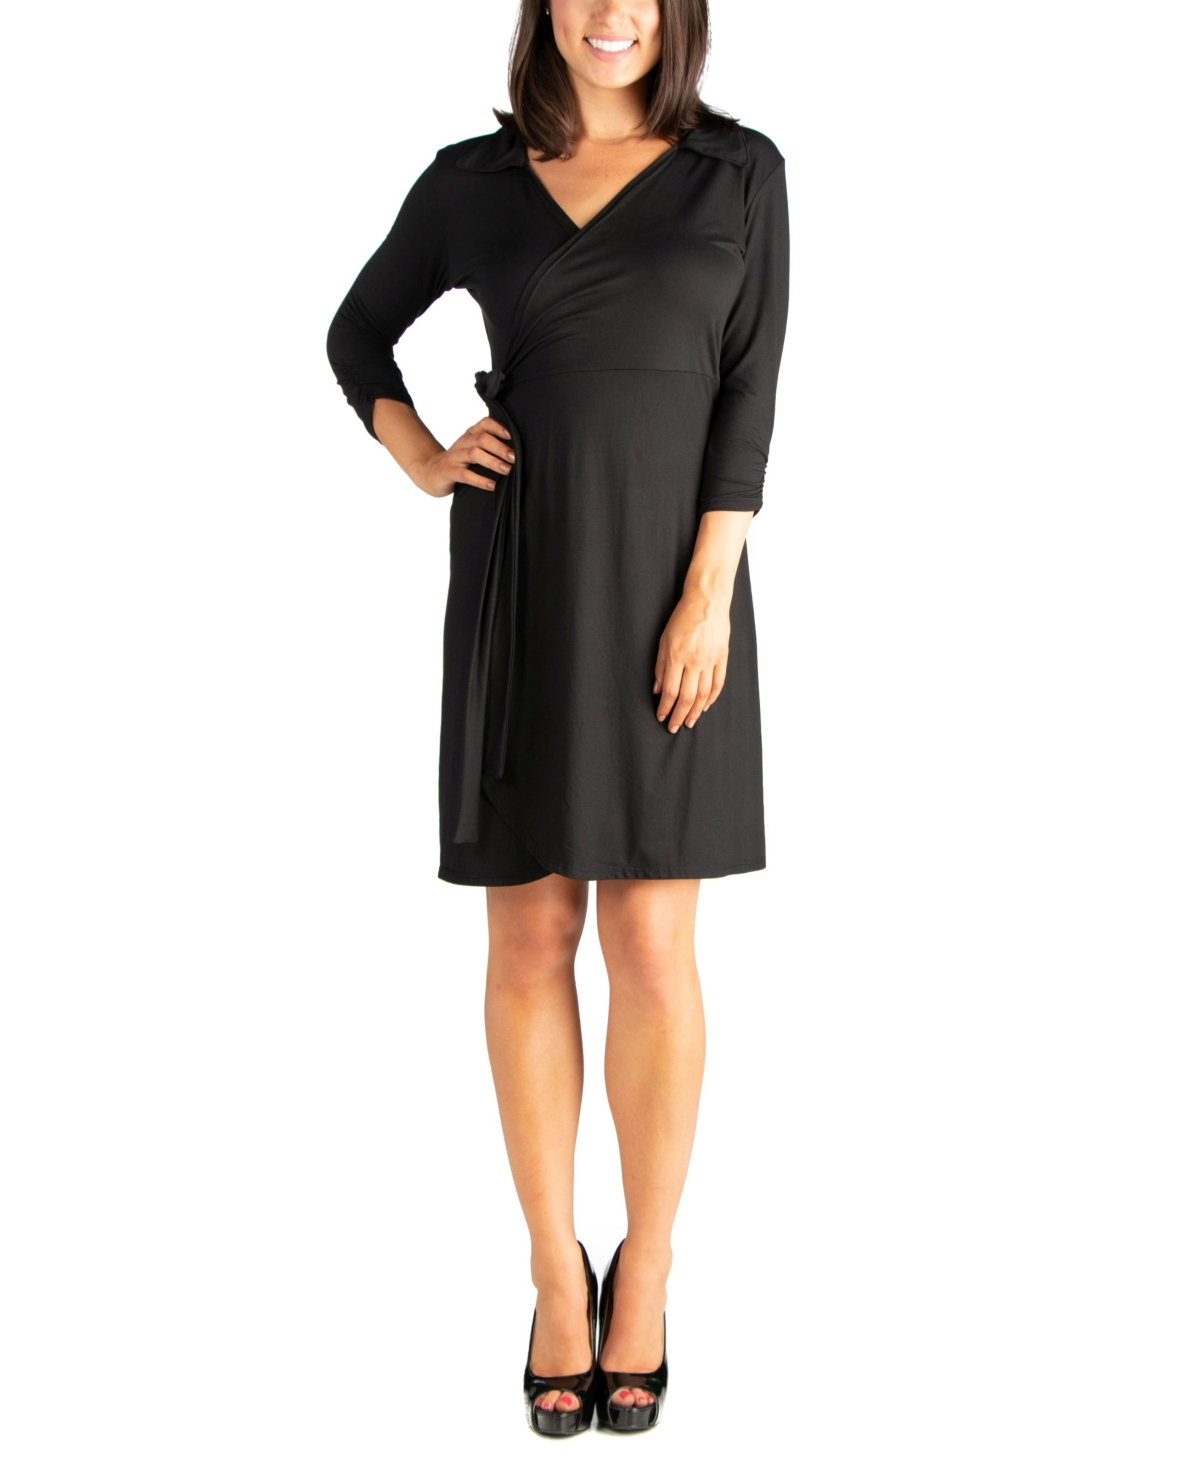 Womens Collared V-Neck 3/4 Sleeve Wrap Dress